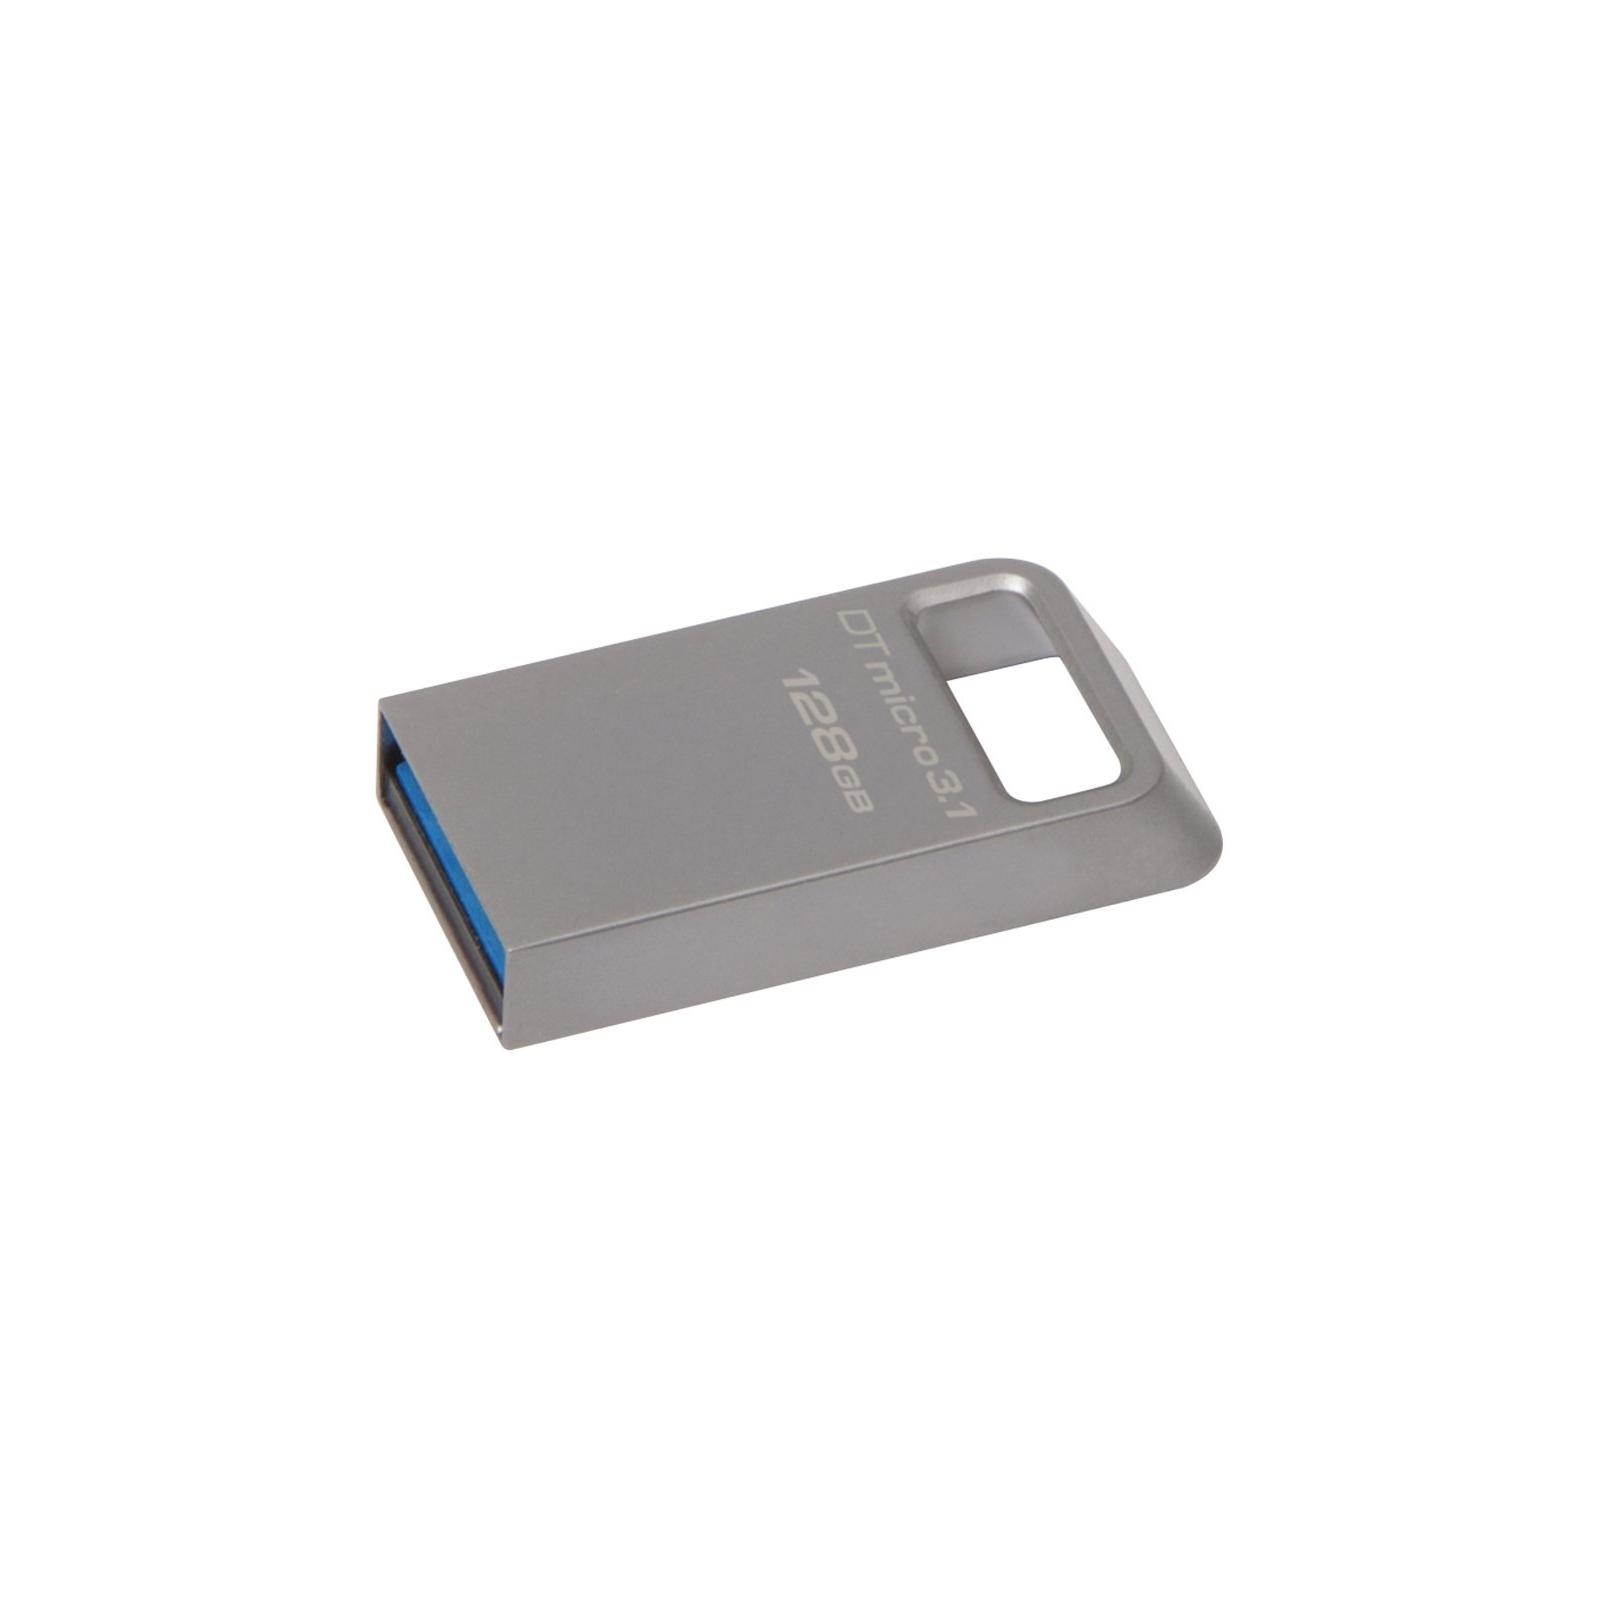 USB флеш накопитель Kingston 128GB DT Micro 3.1 USB 3.1 (DTMC3/128GB) изображение 2